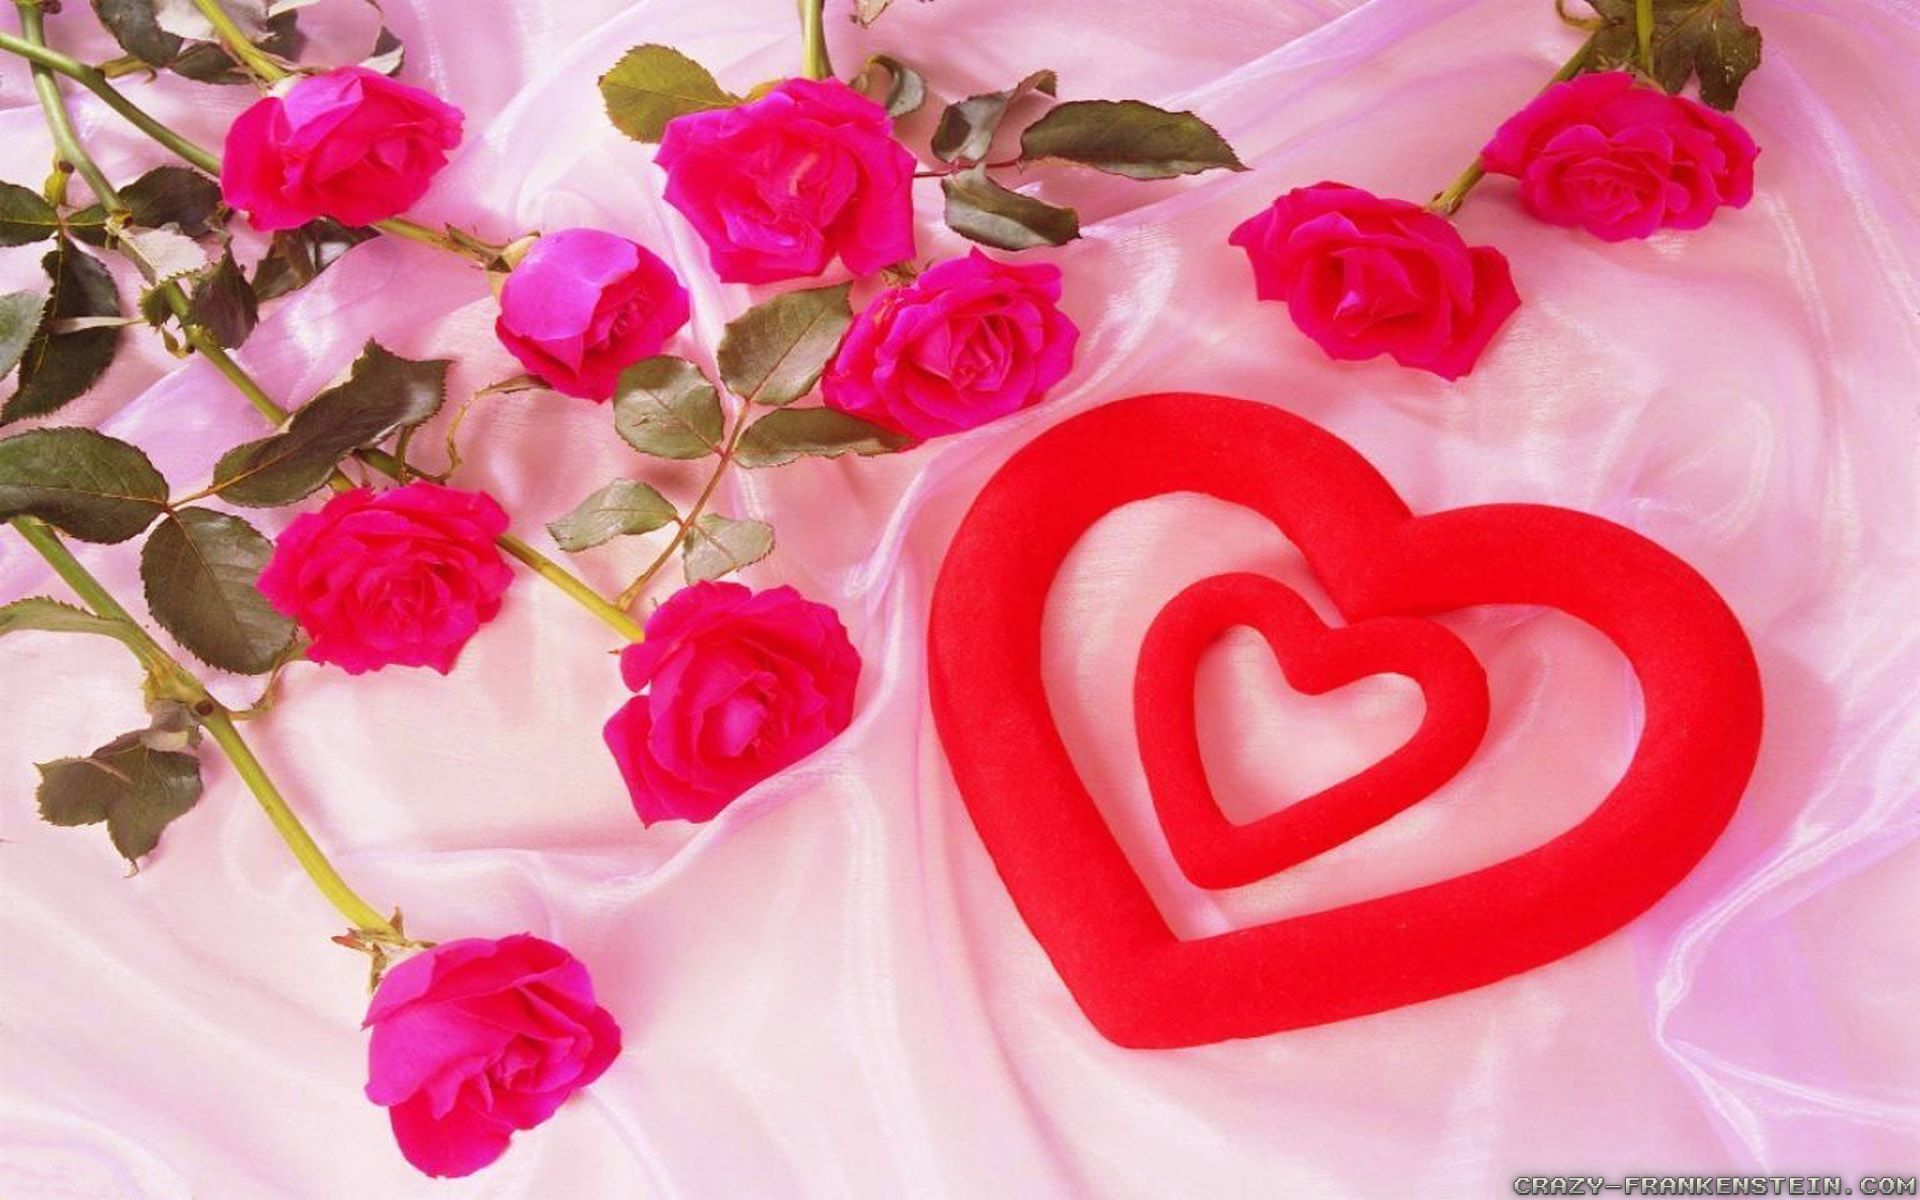 Love flower wallpaper wallpapers for free download about 1920 love flower wallpaper wallpapers for free download about 19201200 love flowers images wallpapers 51 wallpapers adorable wallpapers izmirmasajfo